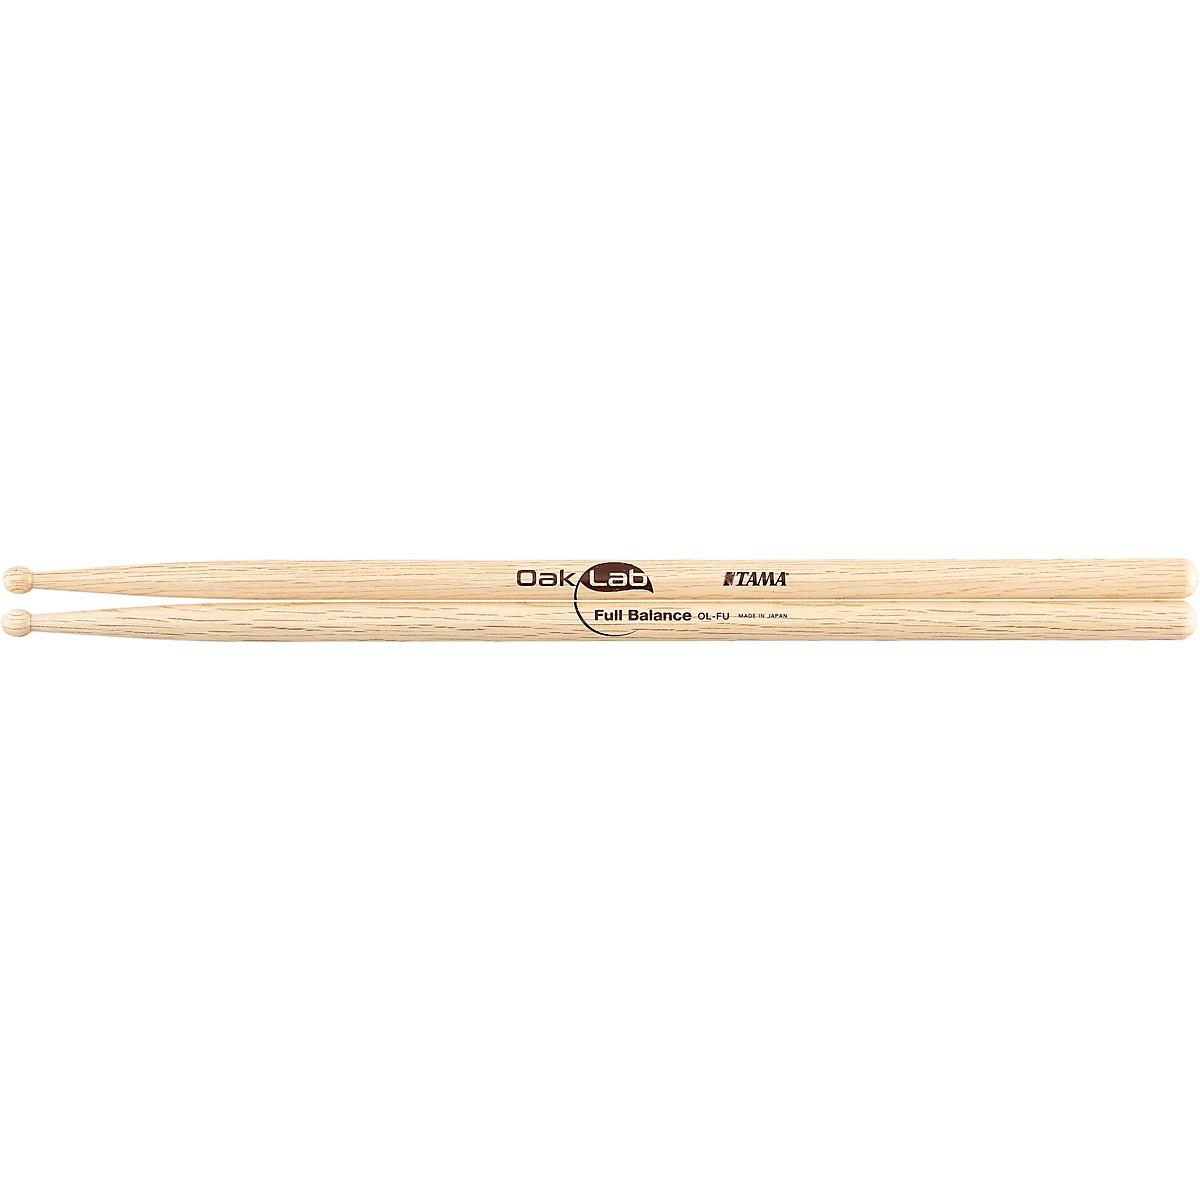 TAMA Oak Lab Series Full Balance Drum Sticks